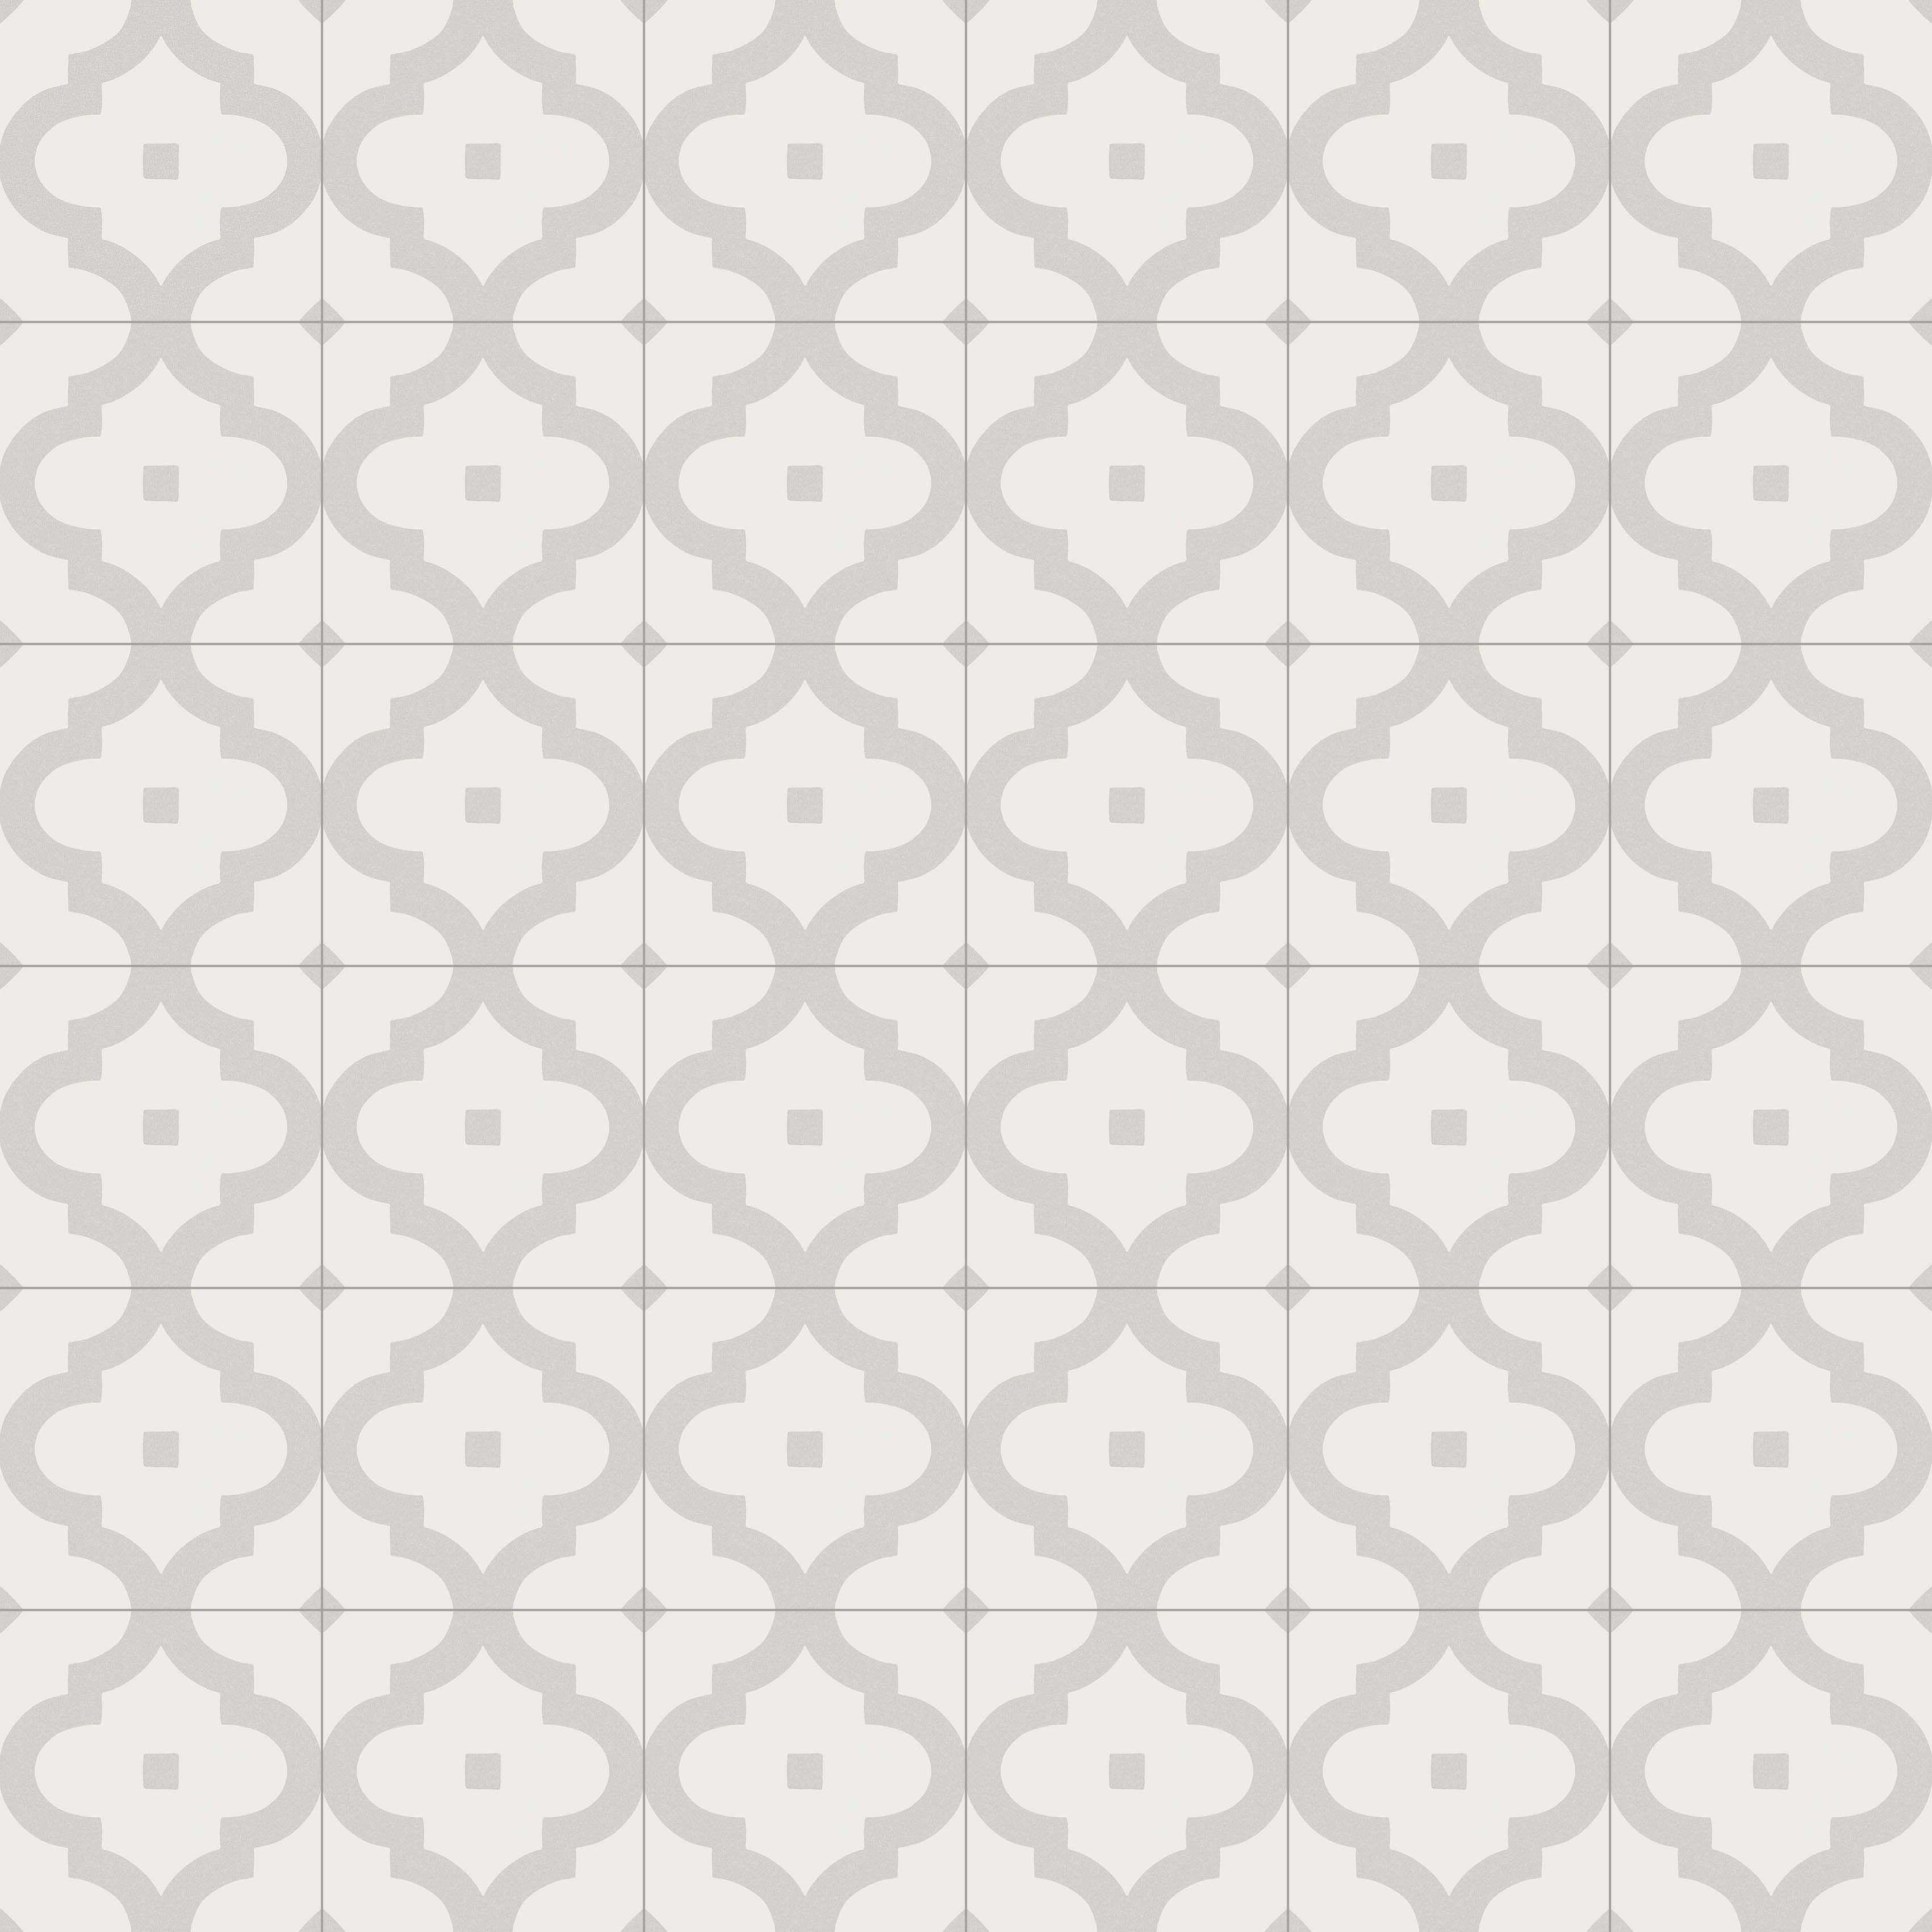 VIVES Pavimento Porcelánico Maori X Porcelánico - 20 x 20 floor tile patterns